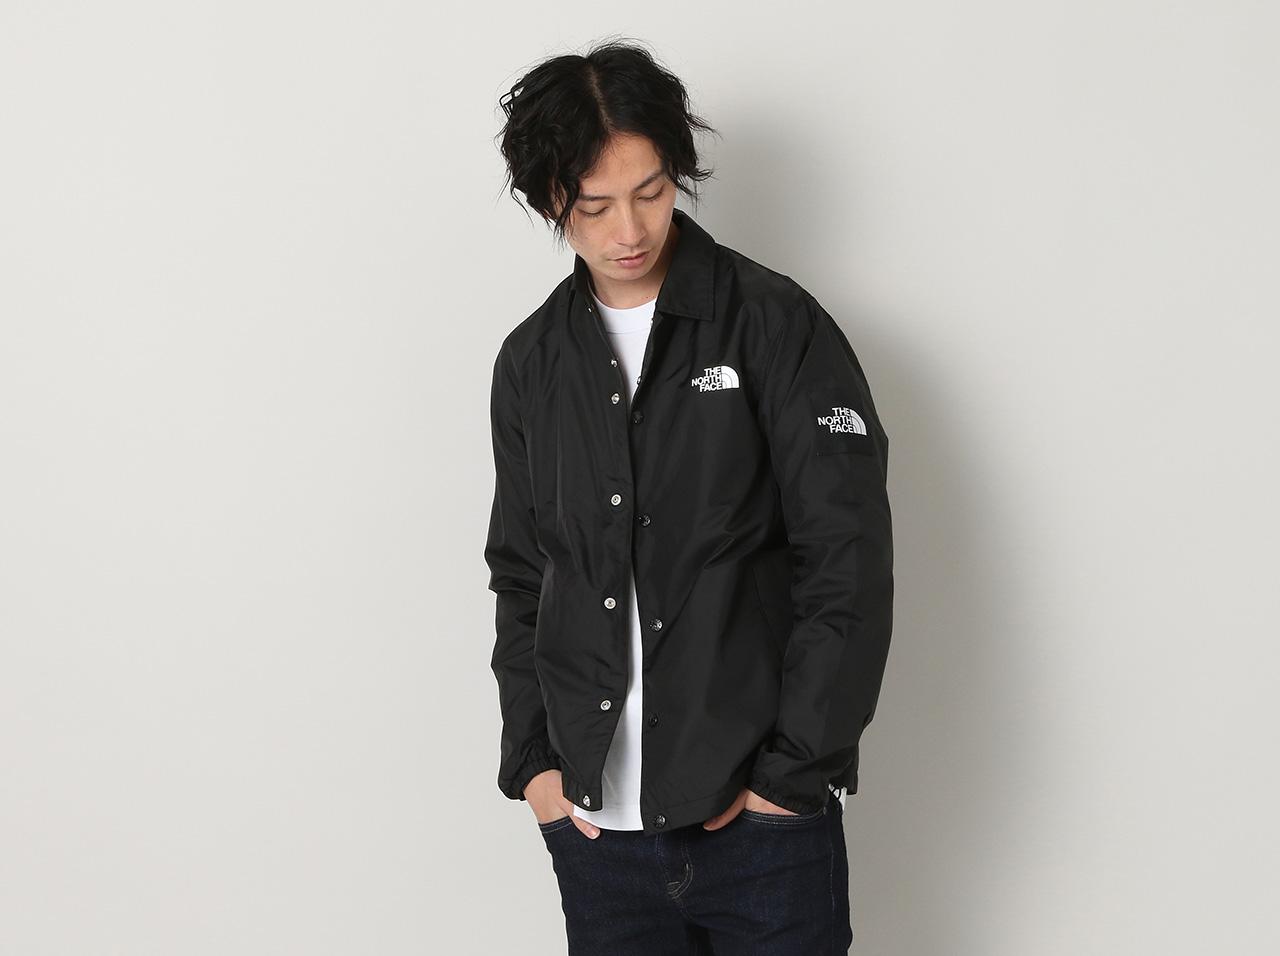 THE NORTH FACE The Coach Jacket(NP21836)【ザノースフェース】【メンズファッション】【アウター】【ジャケット】